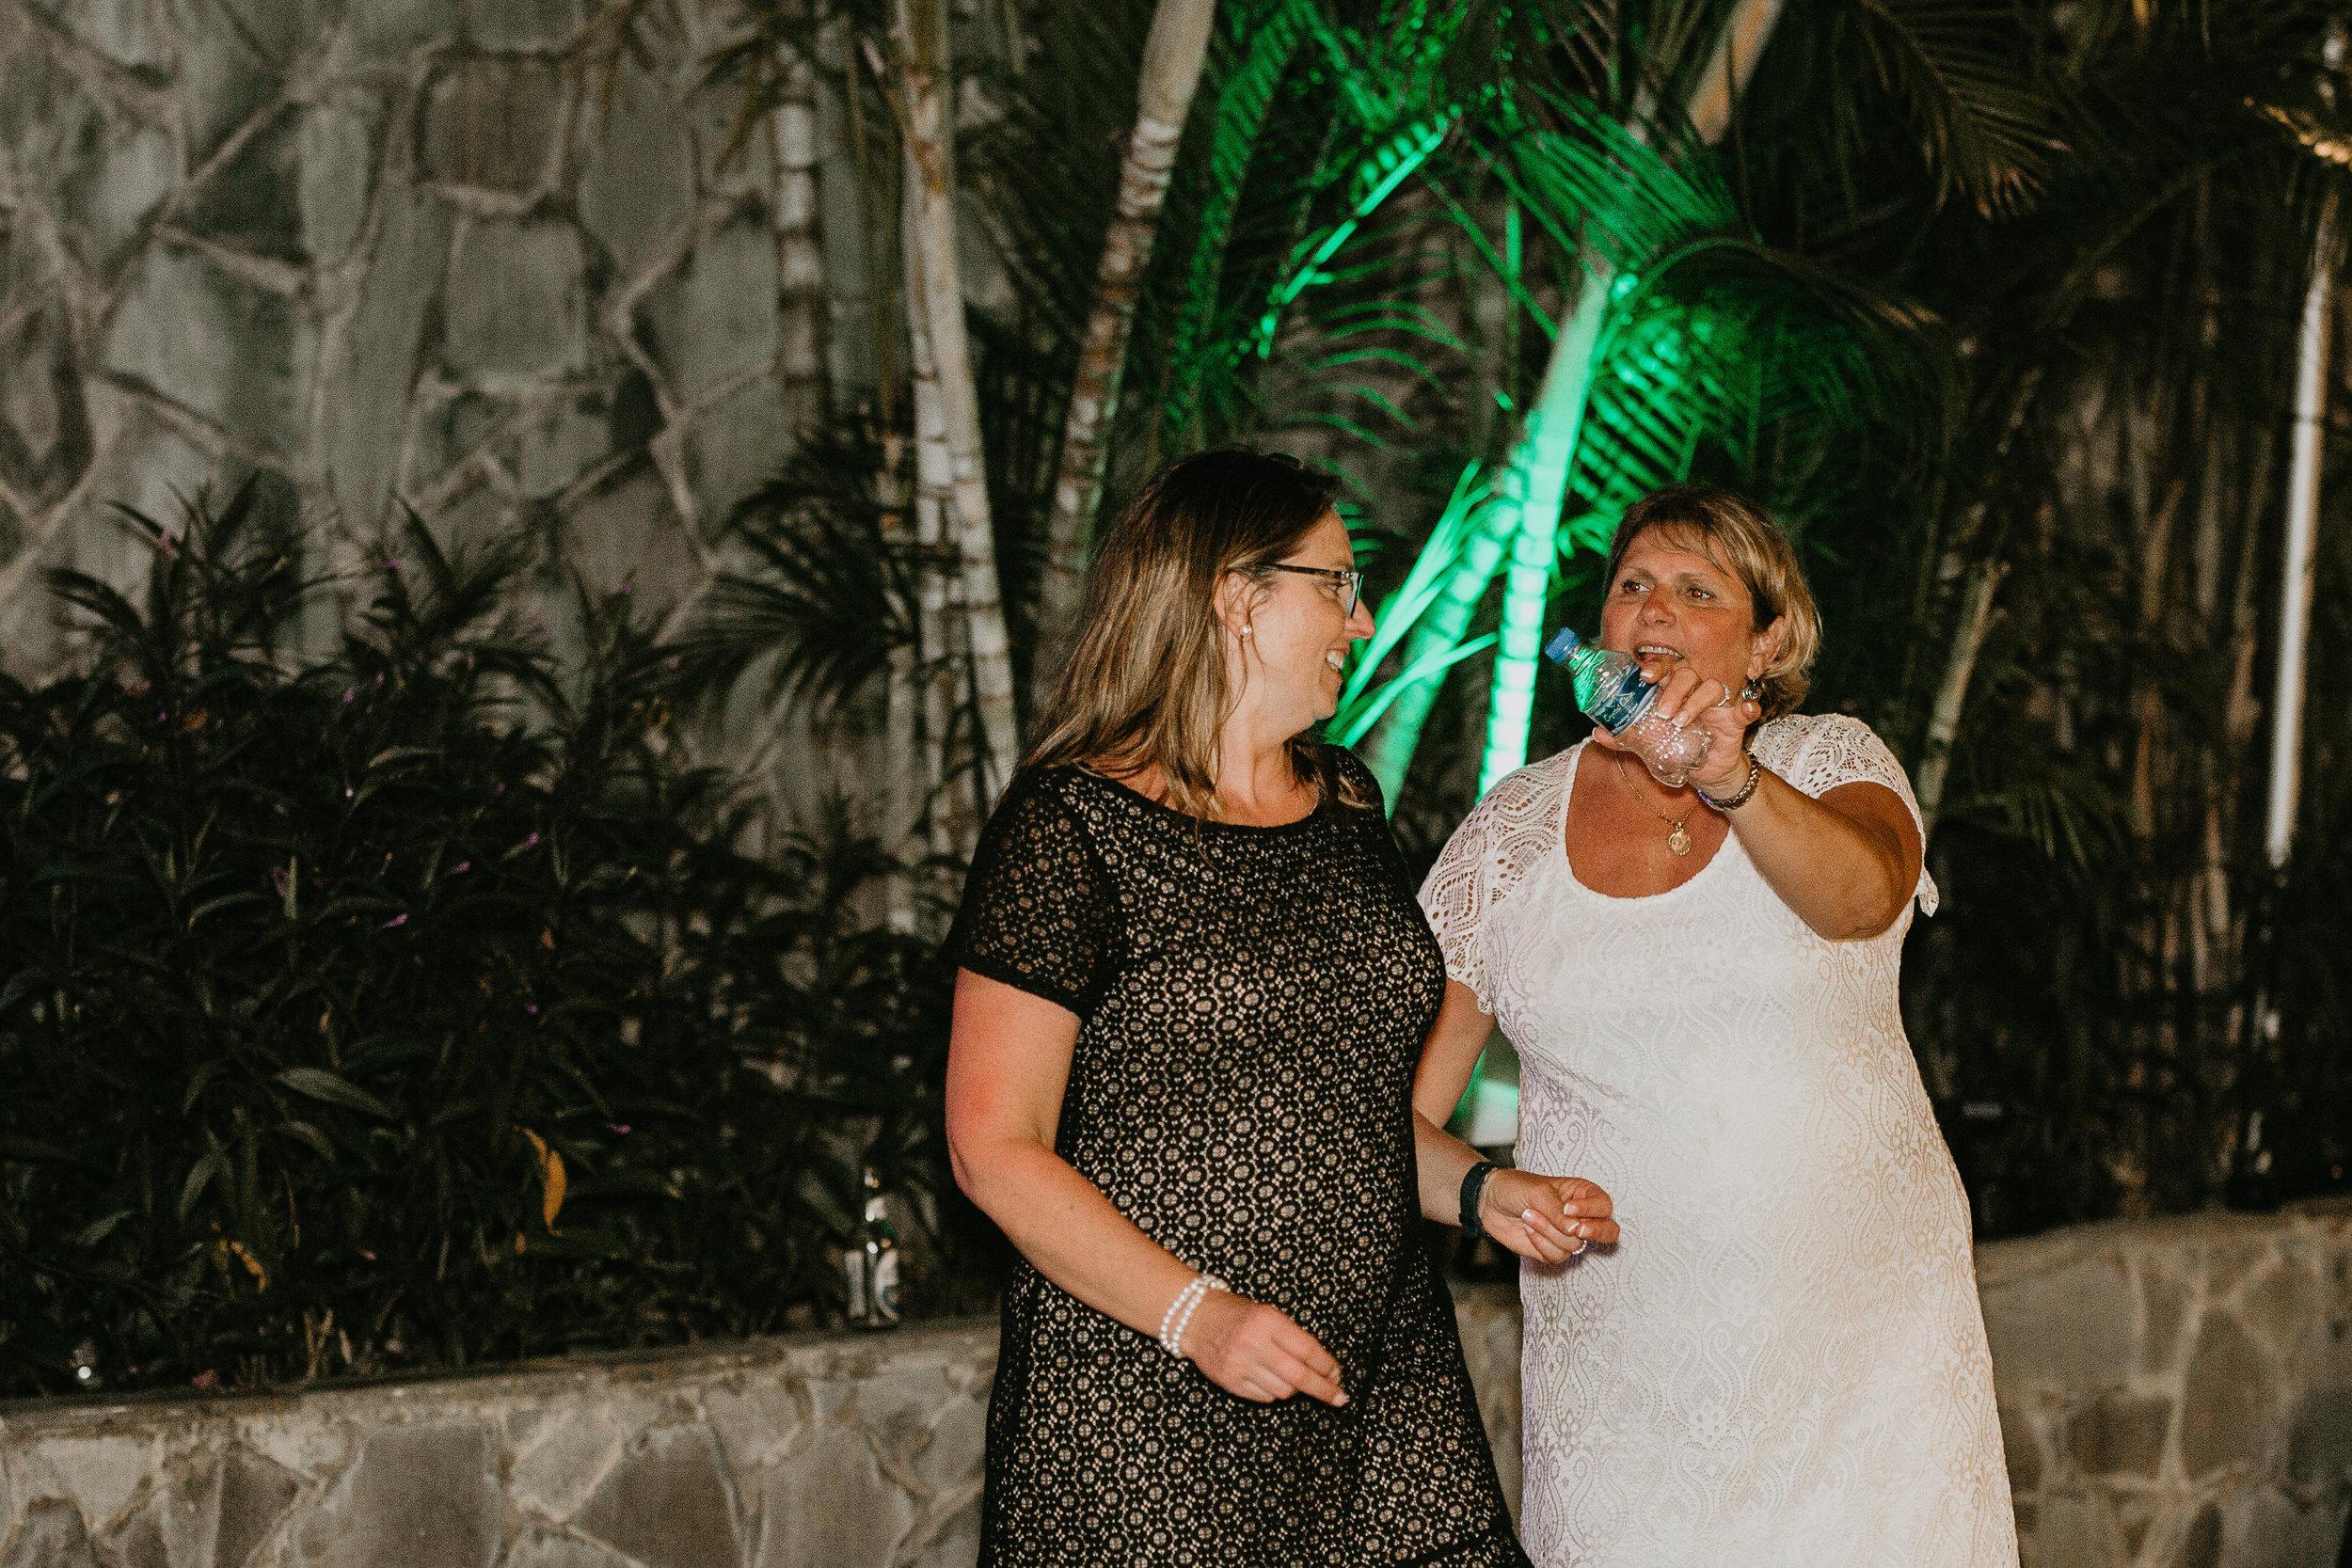 nicole-daacke-photography-destination-wedding-in-st-lucia-sandals-la-toc-intimate-island-wedding-carribean-elopement-photographer-chill-island-wedding-165.jpg